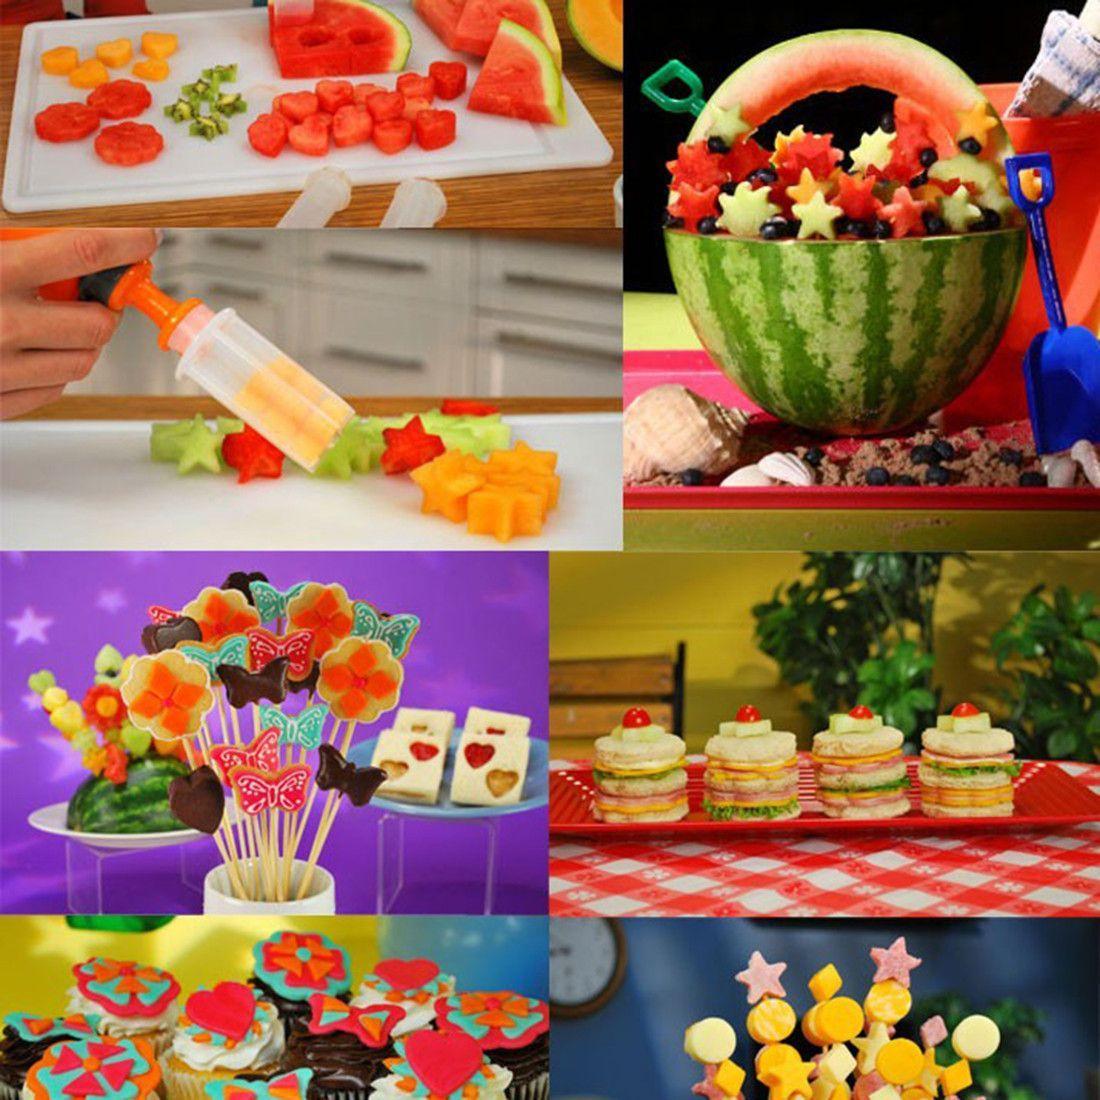 Vegetable and fruit salad arrangements tool kit farmerus market